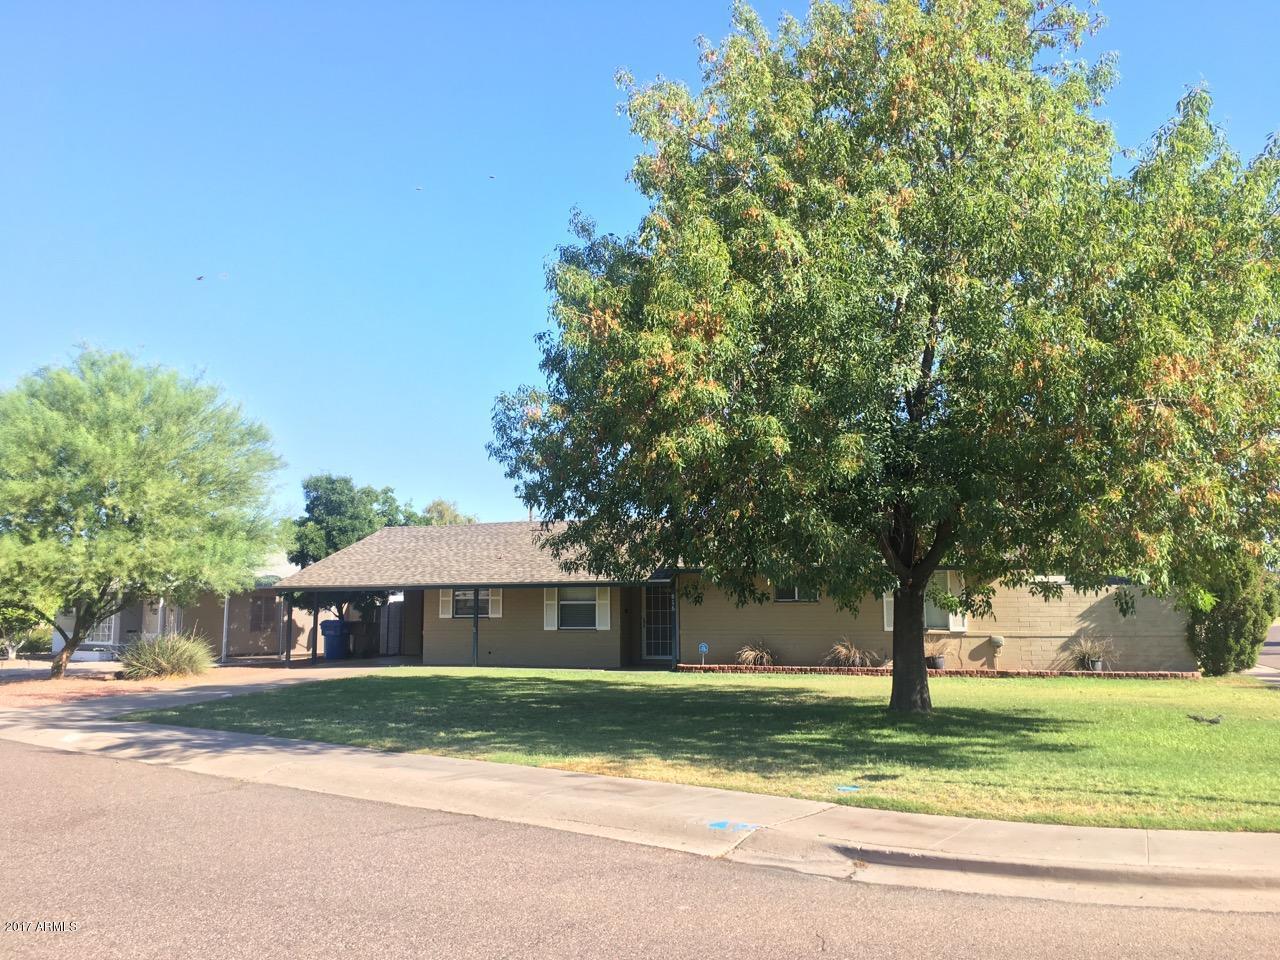 816 E ROVEY Avenue, Phoenix, AZ 85014